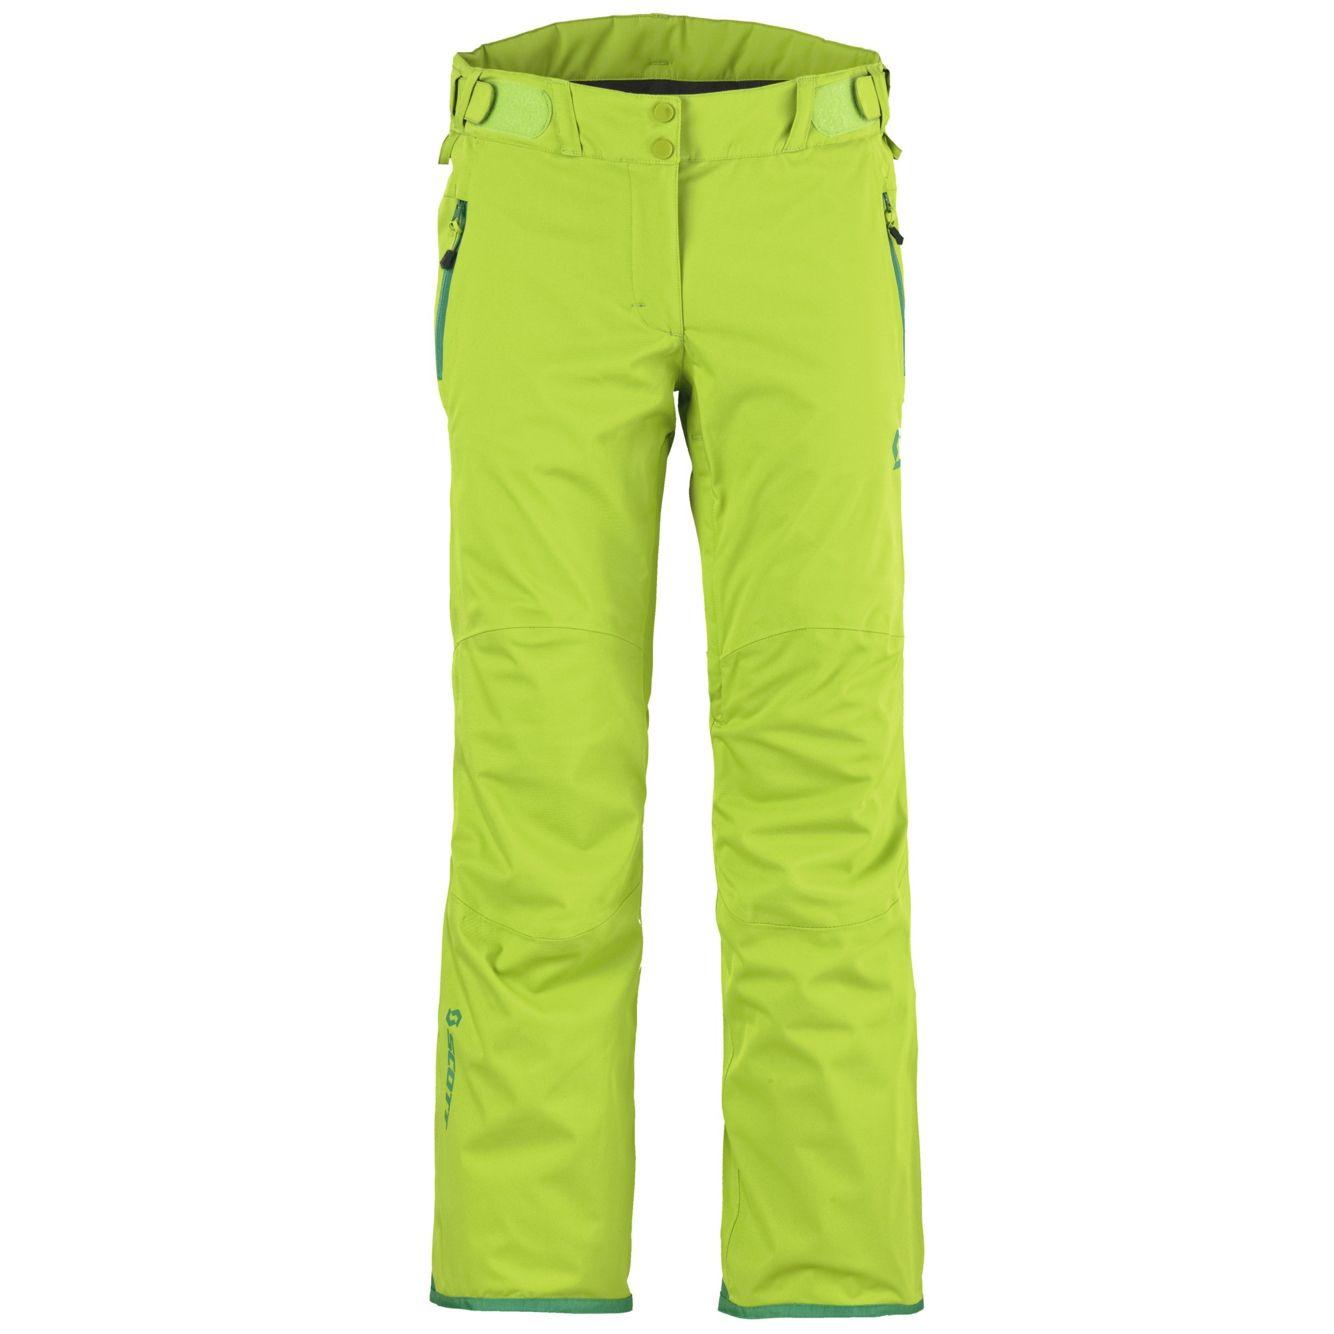 Apple Green Pants | Gpant